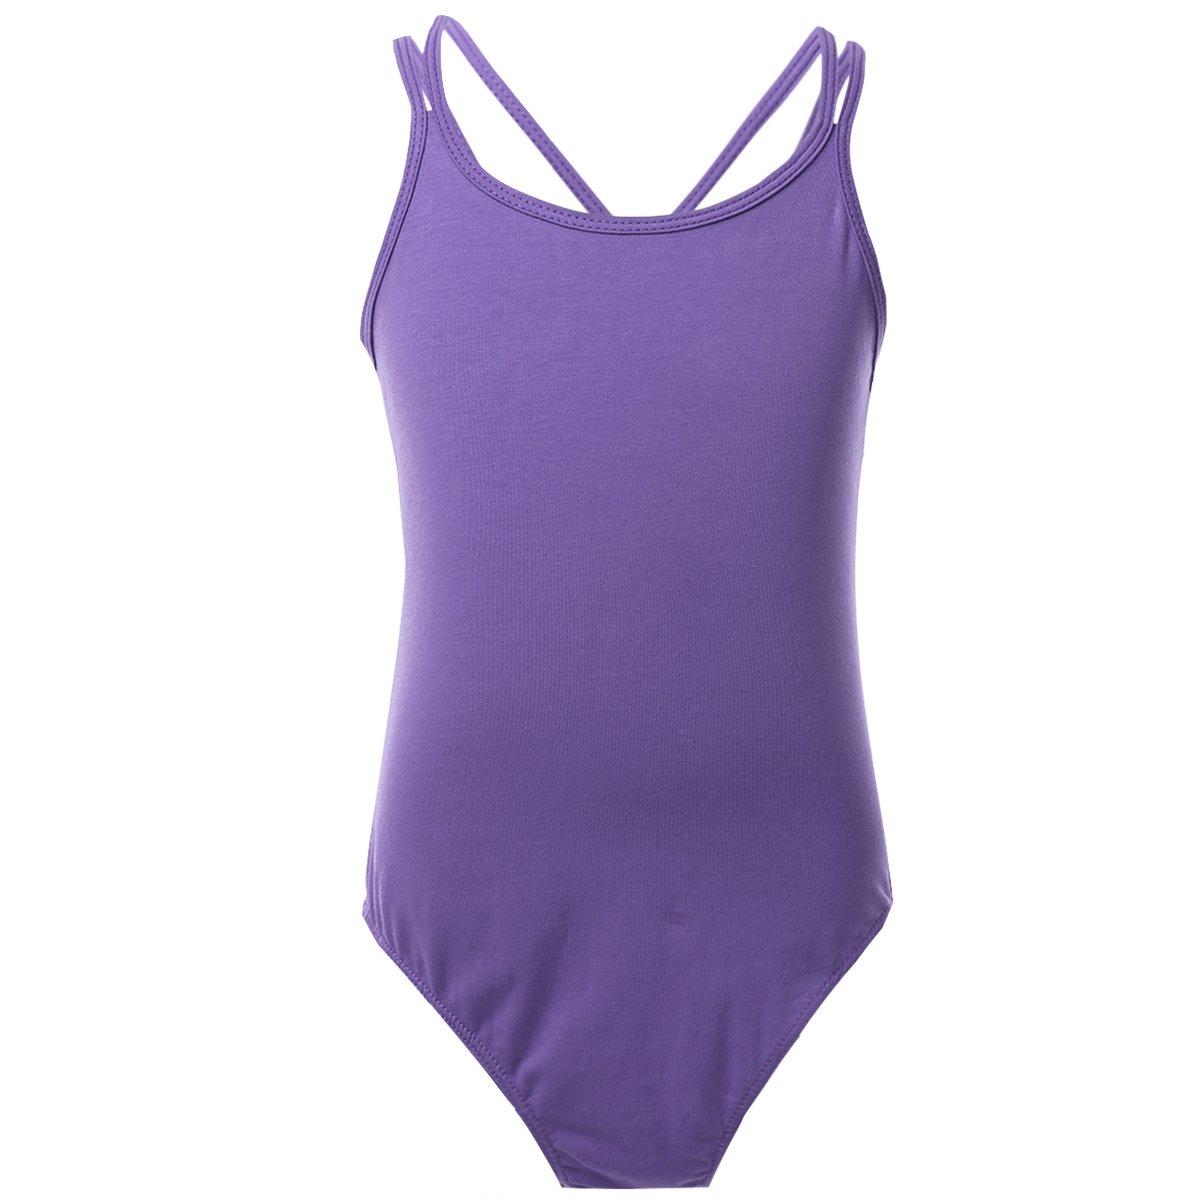 inhzoy Teen Kids Girls Criss Cross Back Camisole Leotard Cotton Basic Sport Dance Undershirts